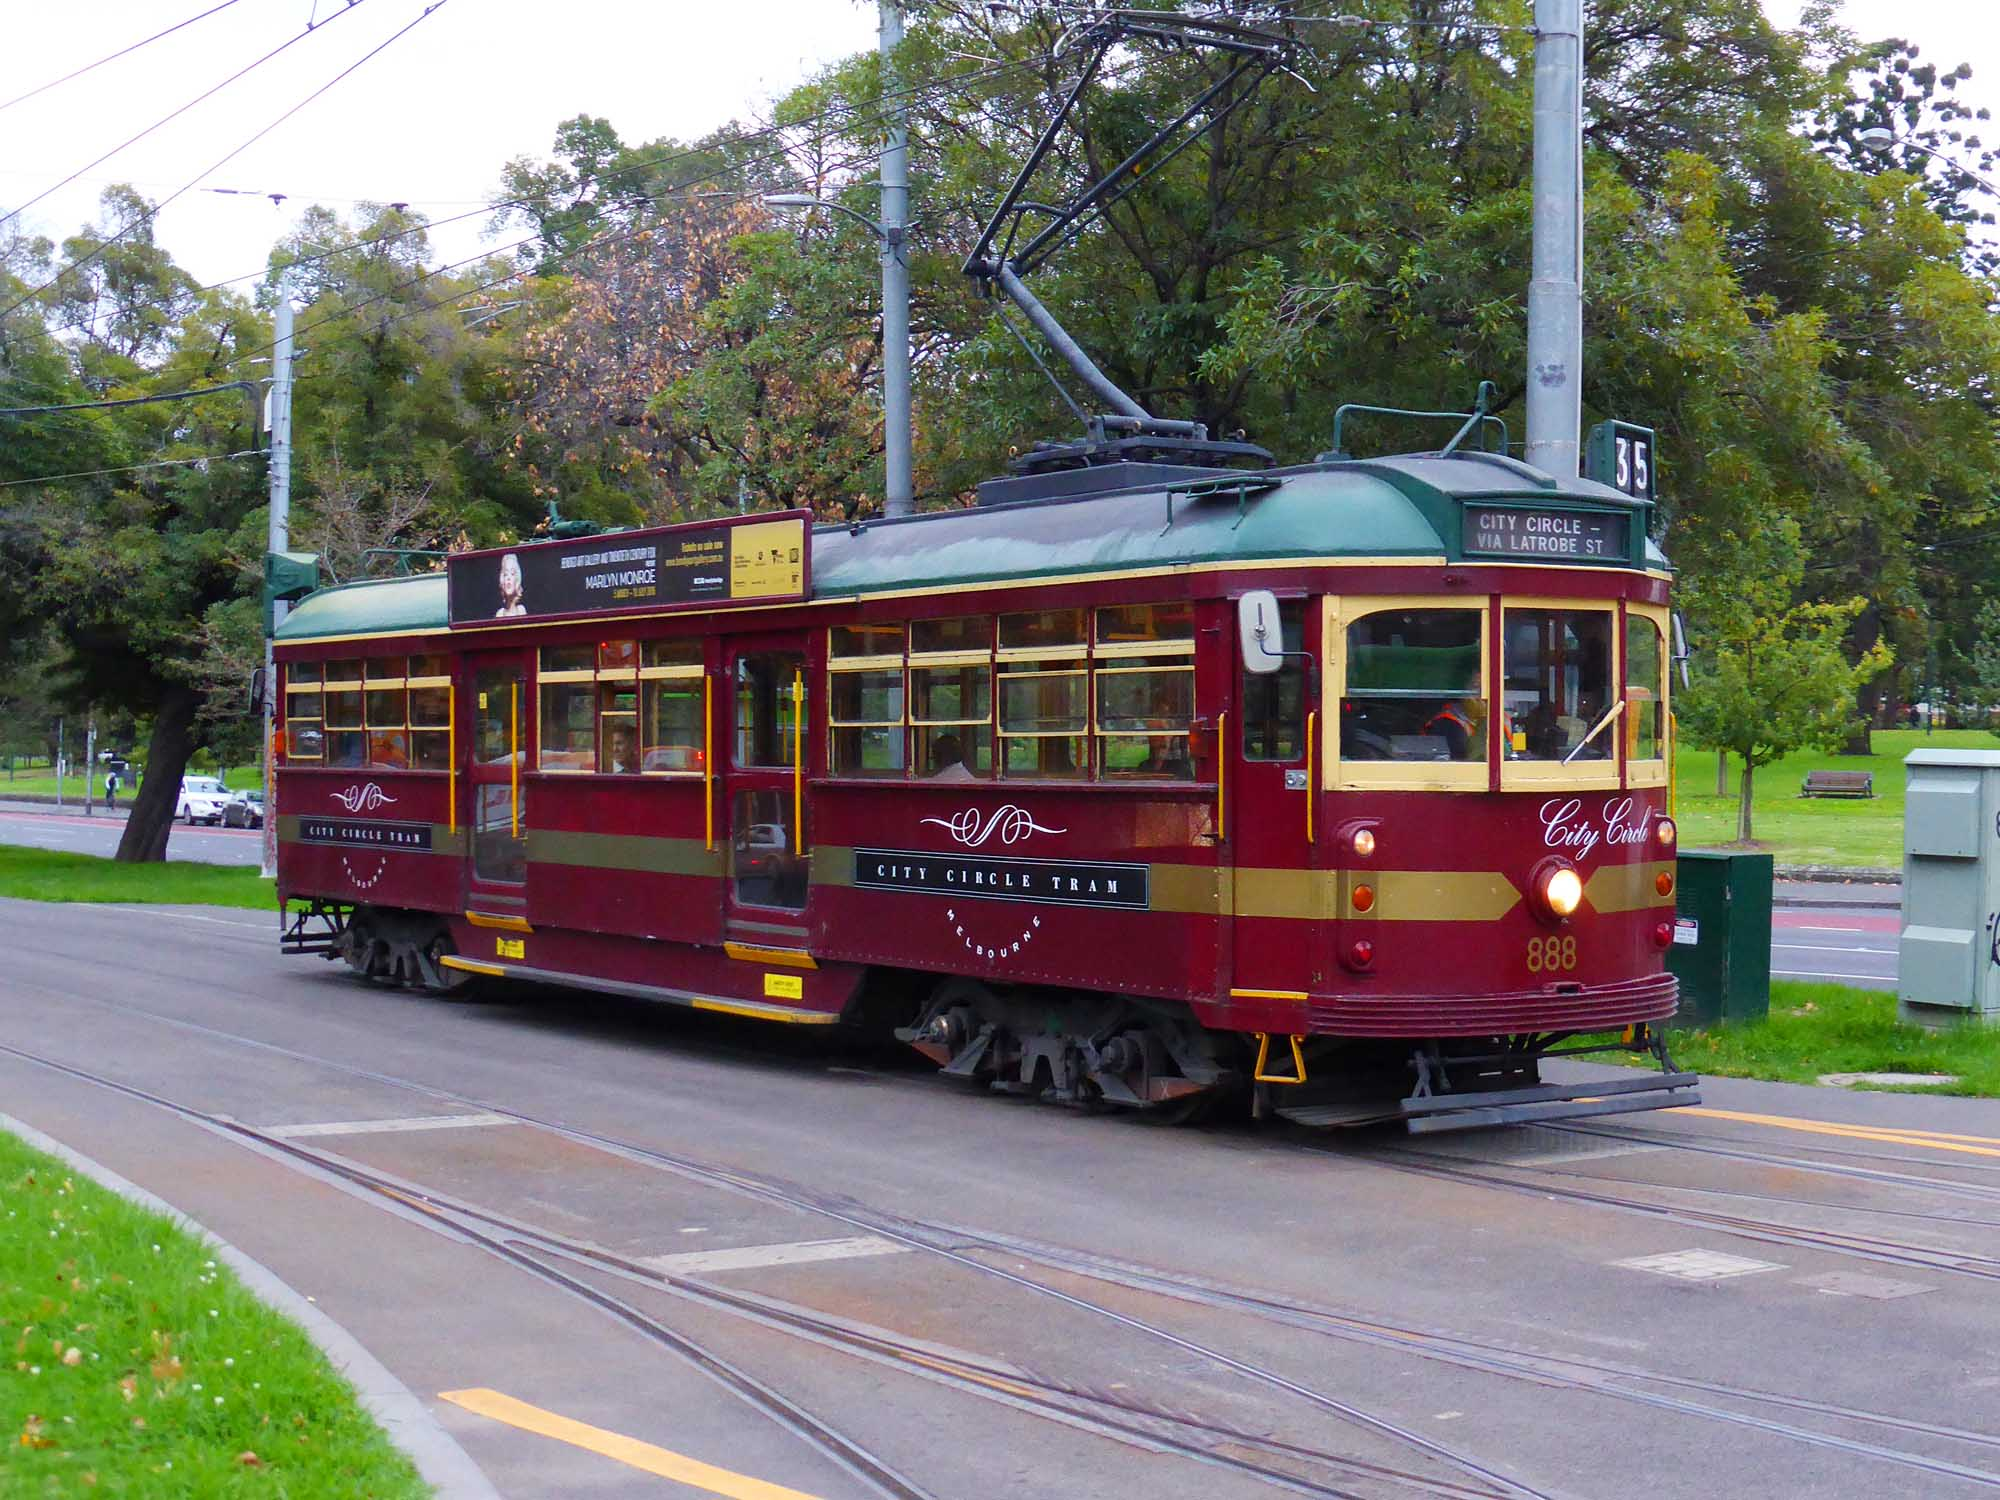 A Melbourne tourist tram